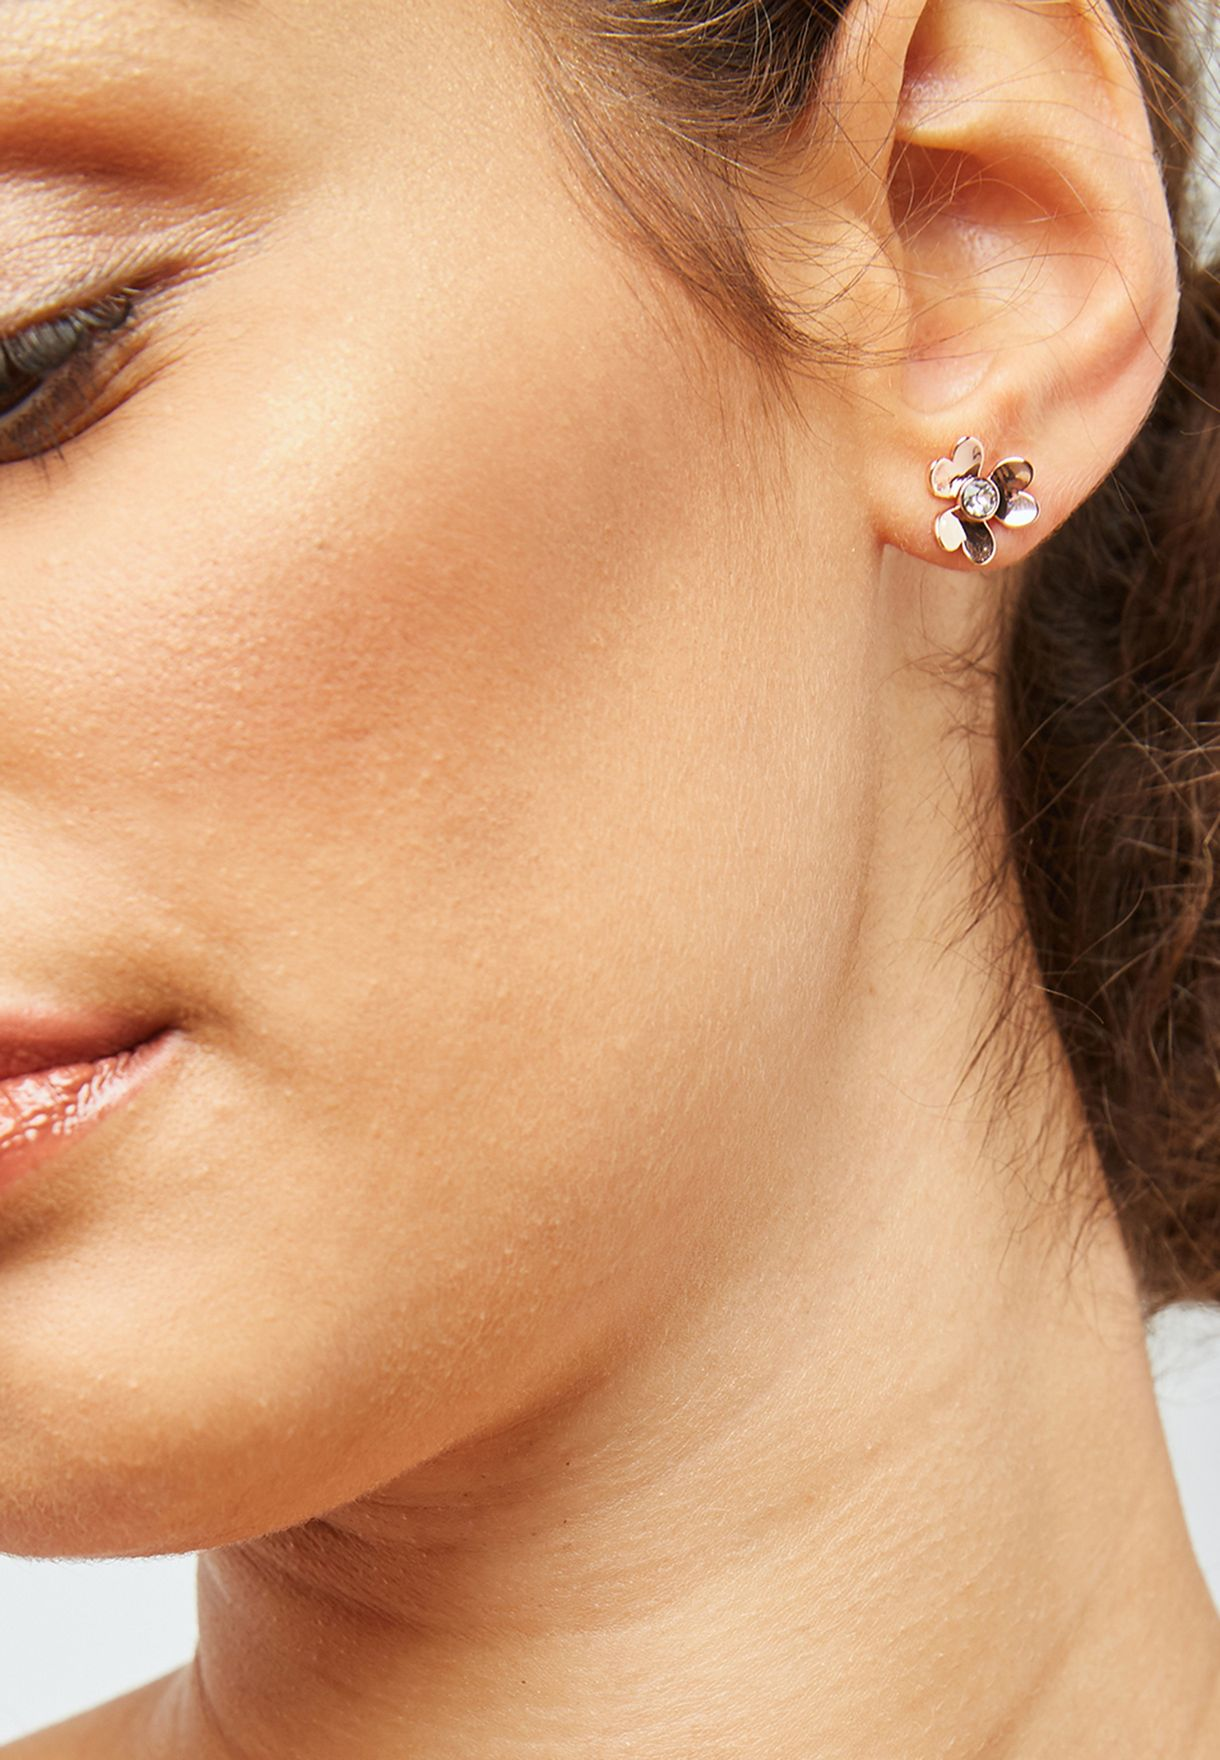 f87e8a76f Shop Ted baker gold Hansila Heart Blossom Stud Earrings TBJ1862-24 ...